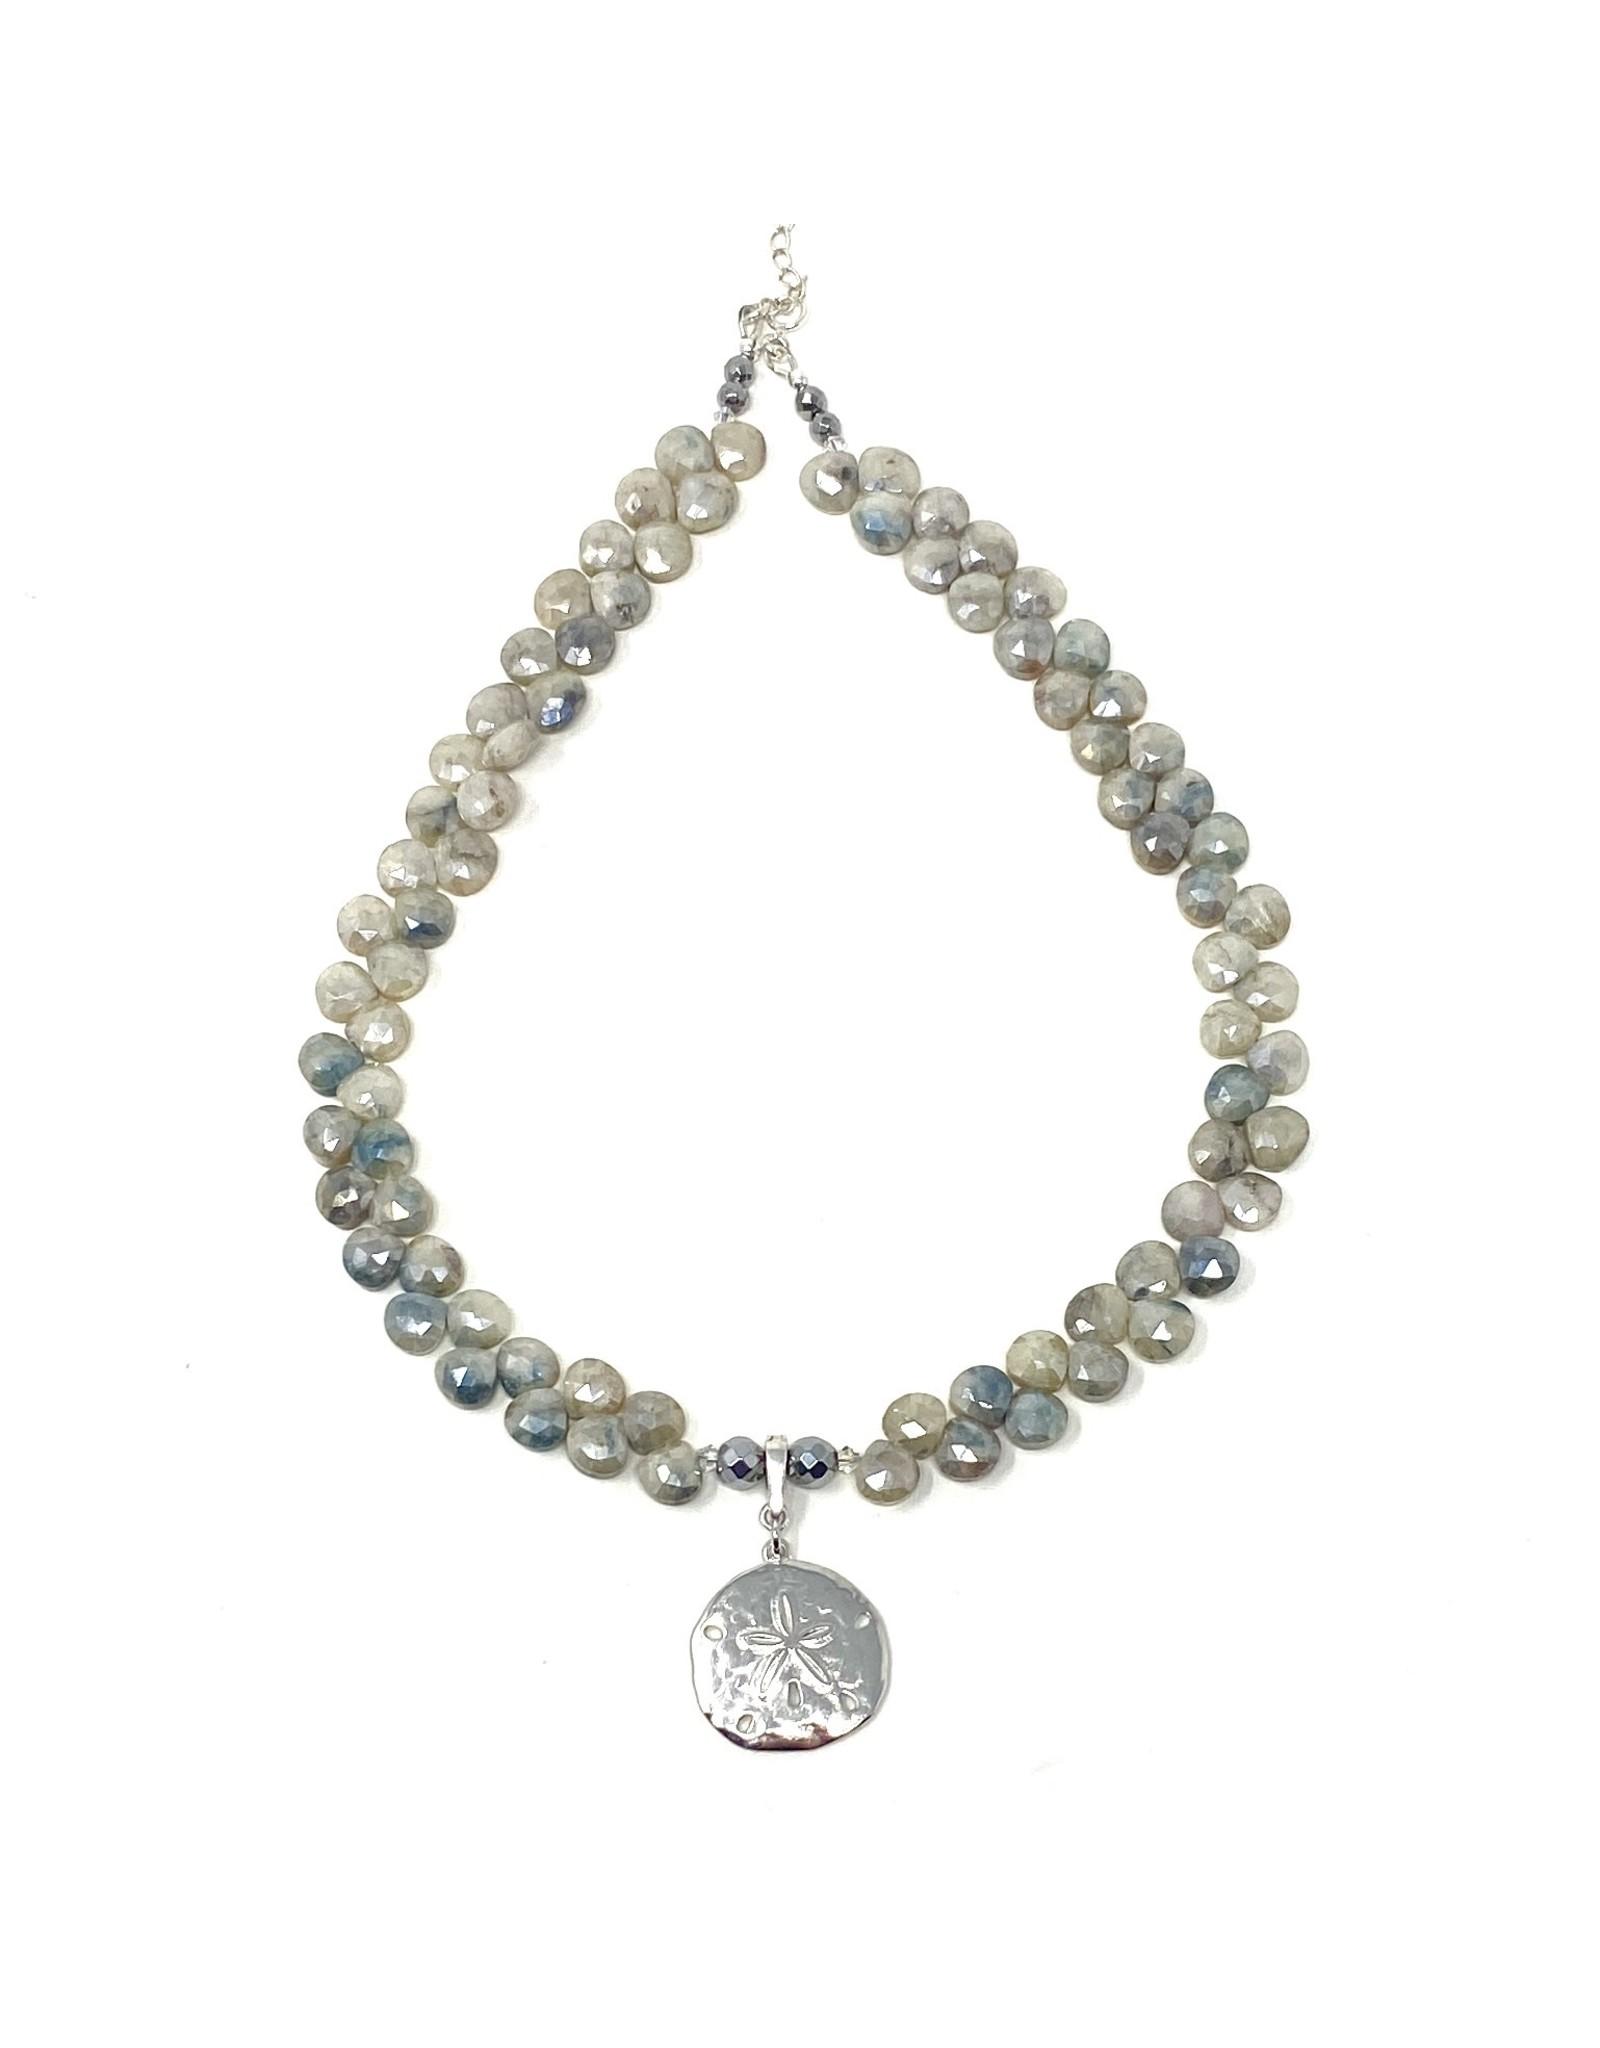 Briolette Silverite Necklace